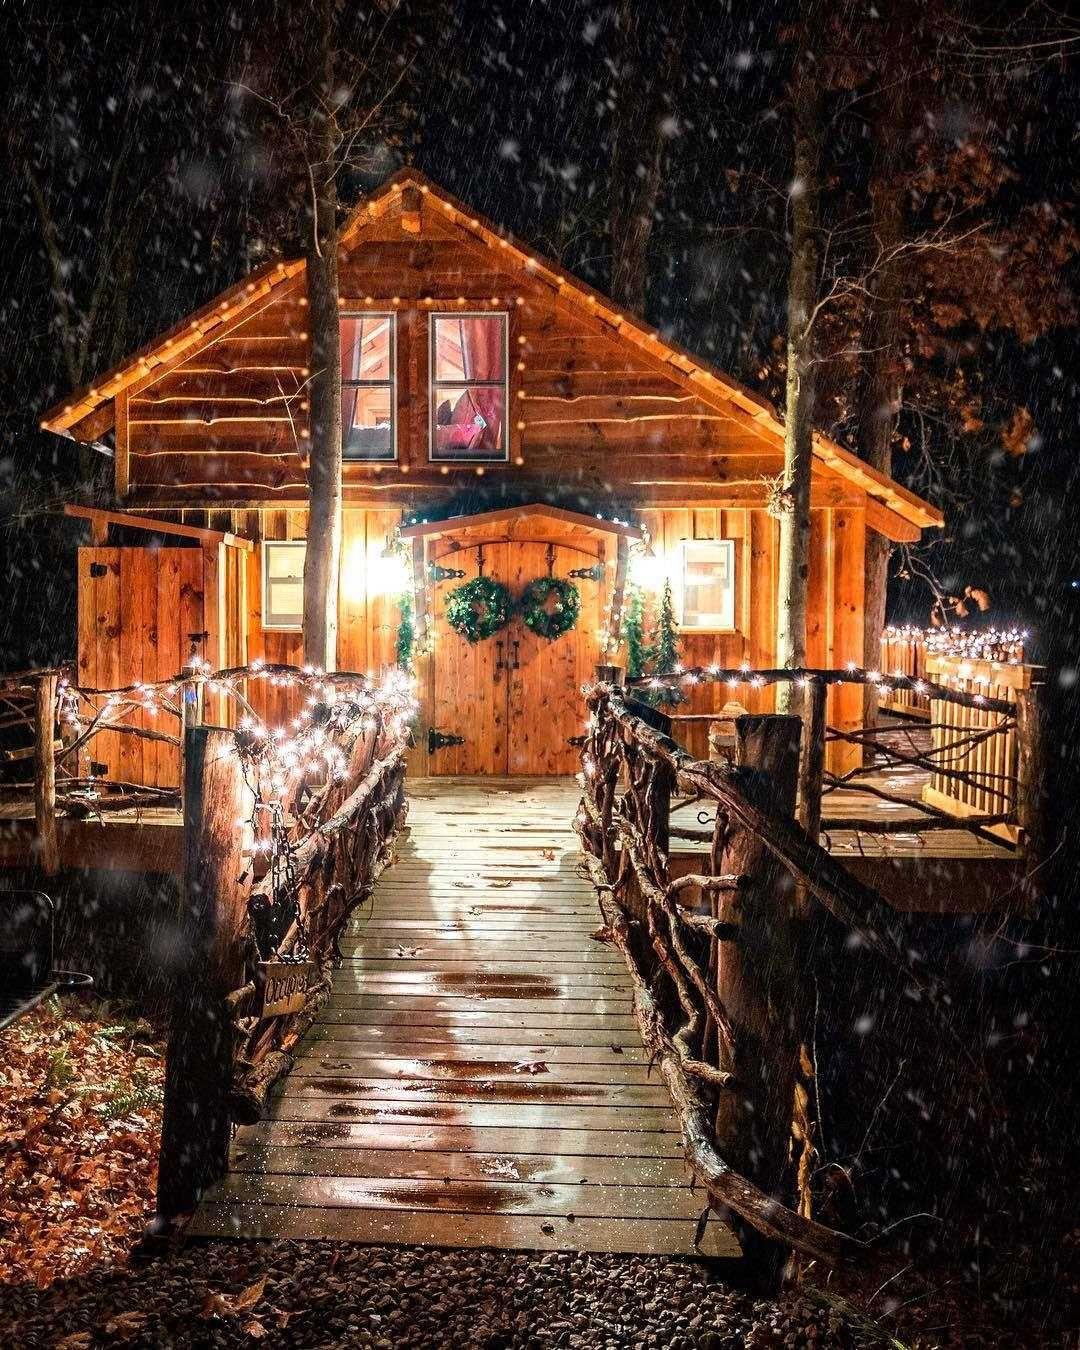 Cozy Winter Edition #495 – Joy To The World